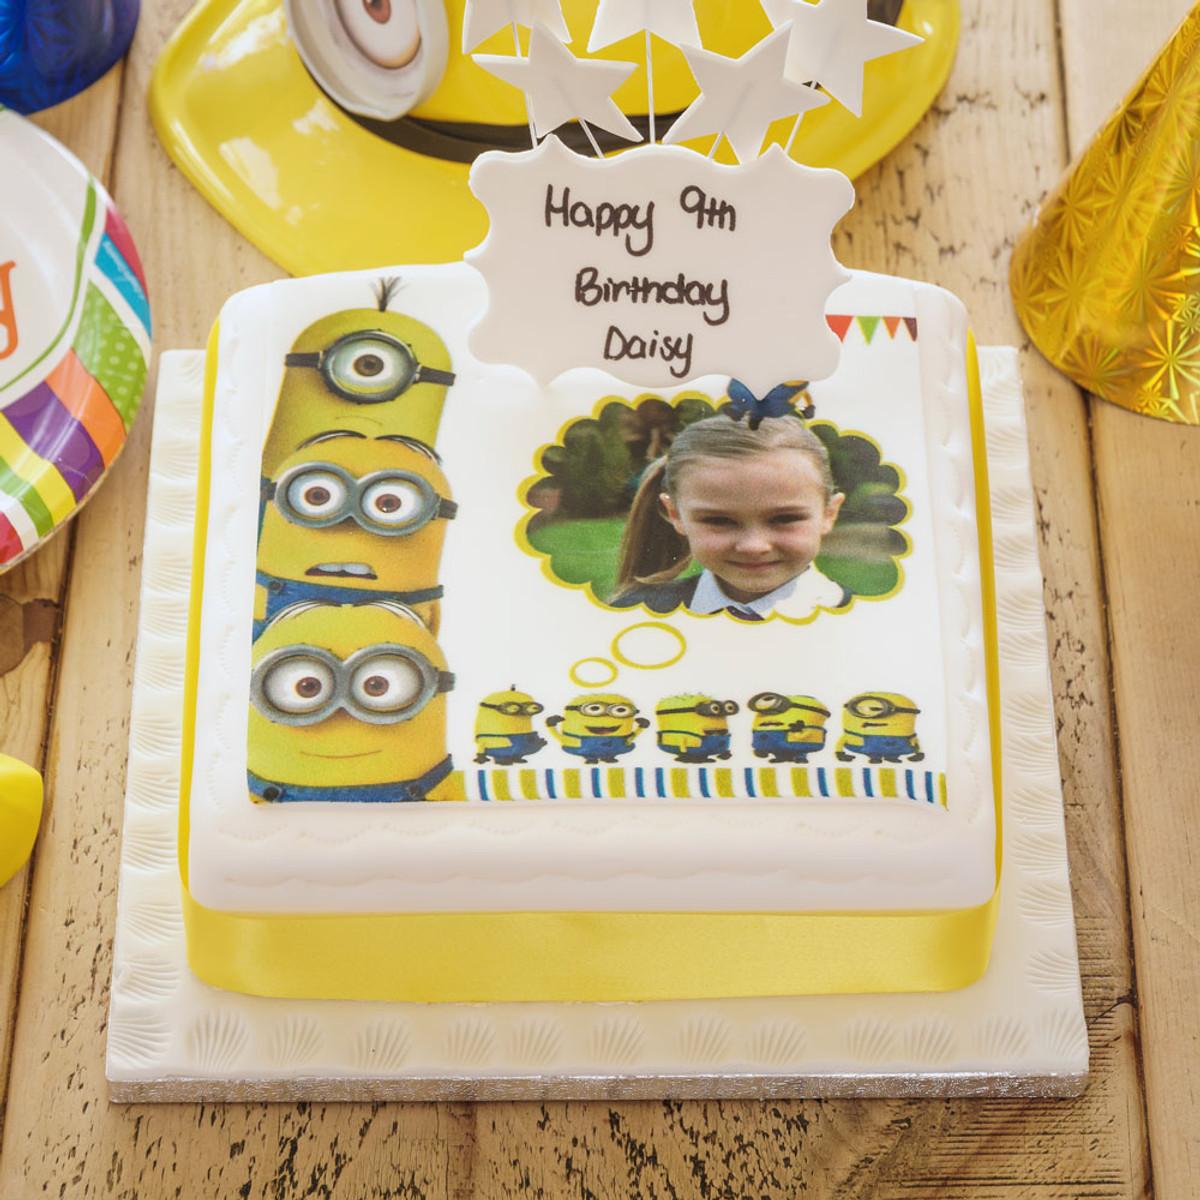 Groovy Minions Photo Cake Birthday Cakes The Brilliant Bakers Funny Birthday Cards Online Elaedamsfinfo